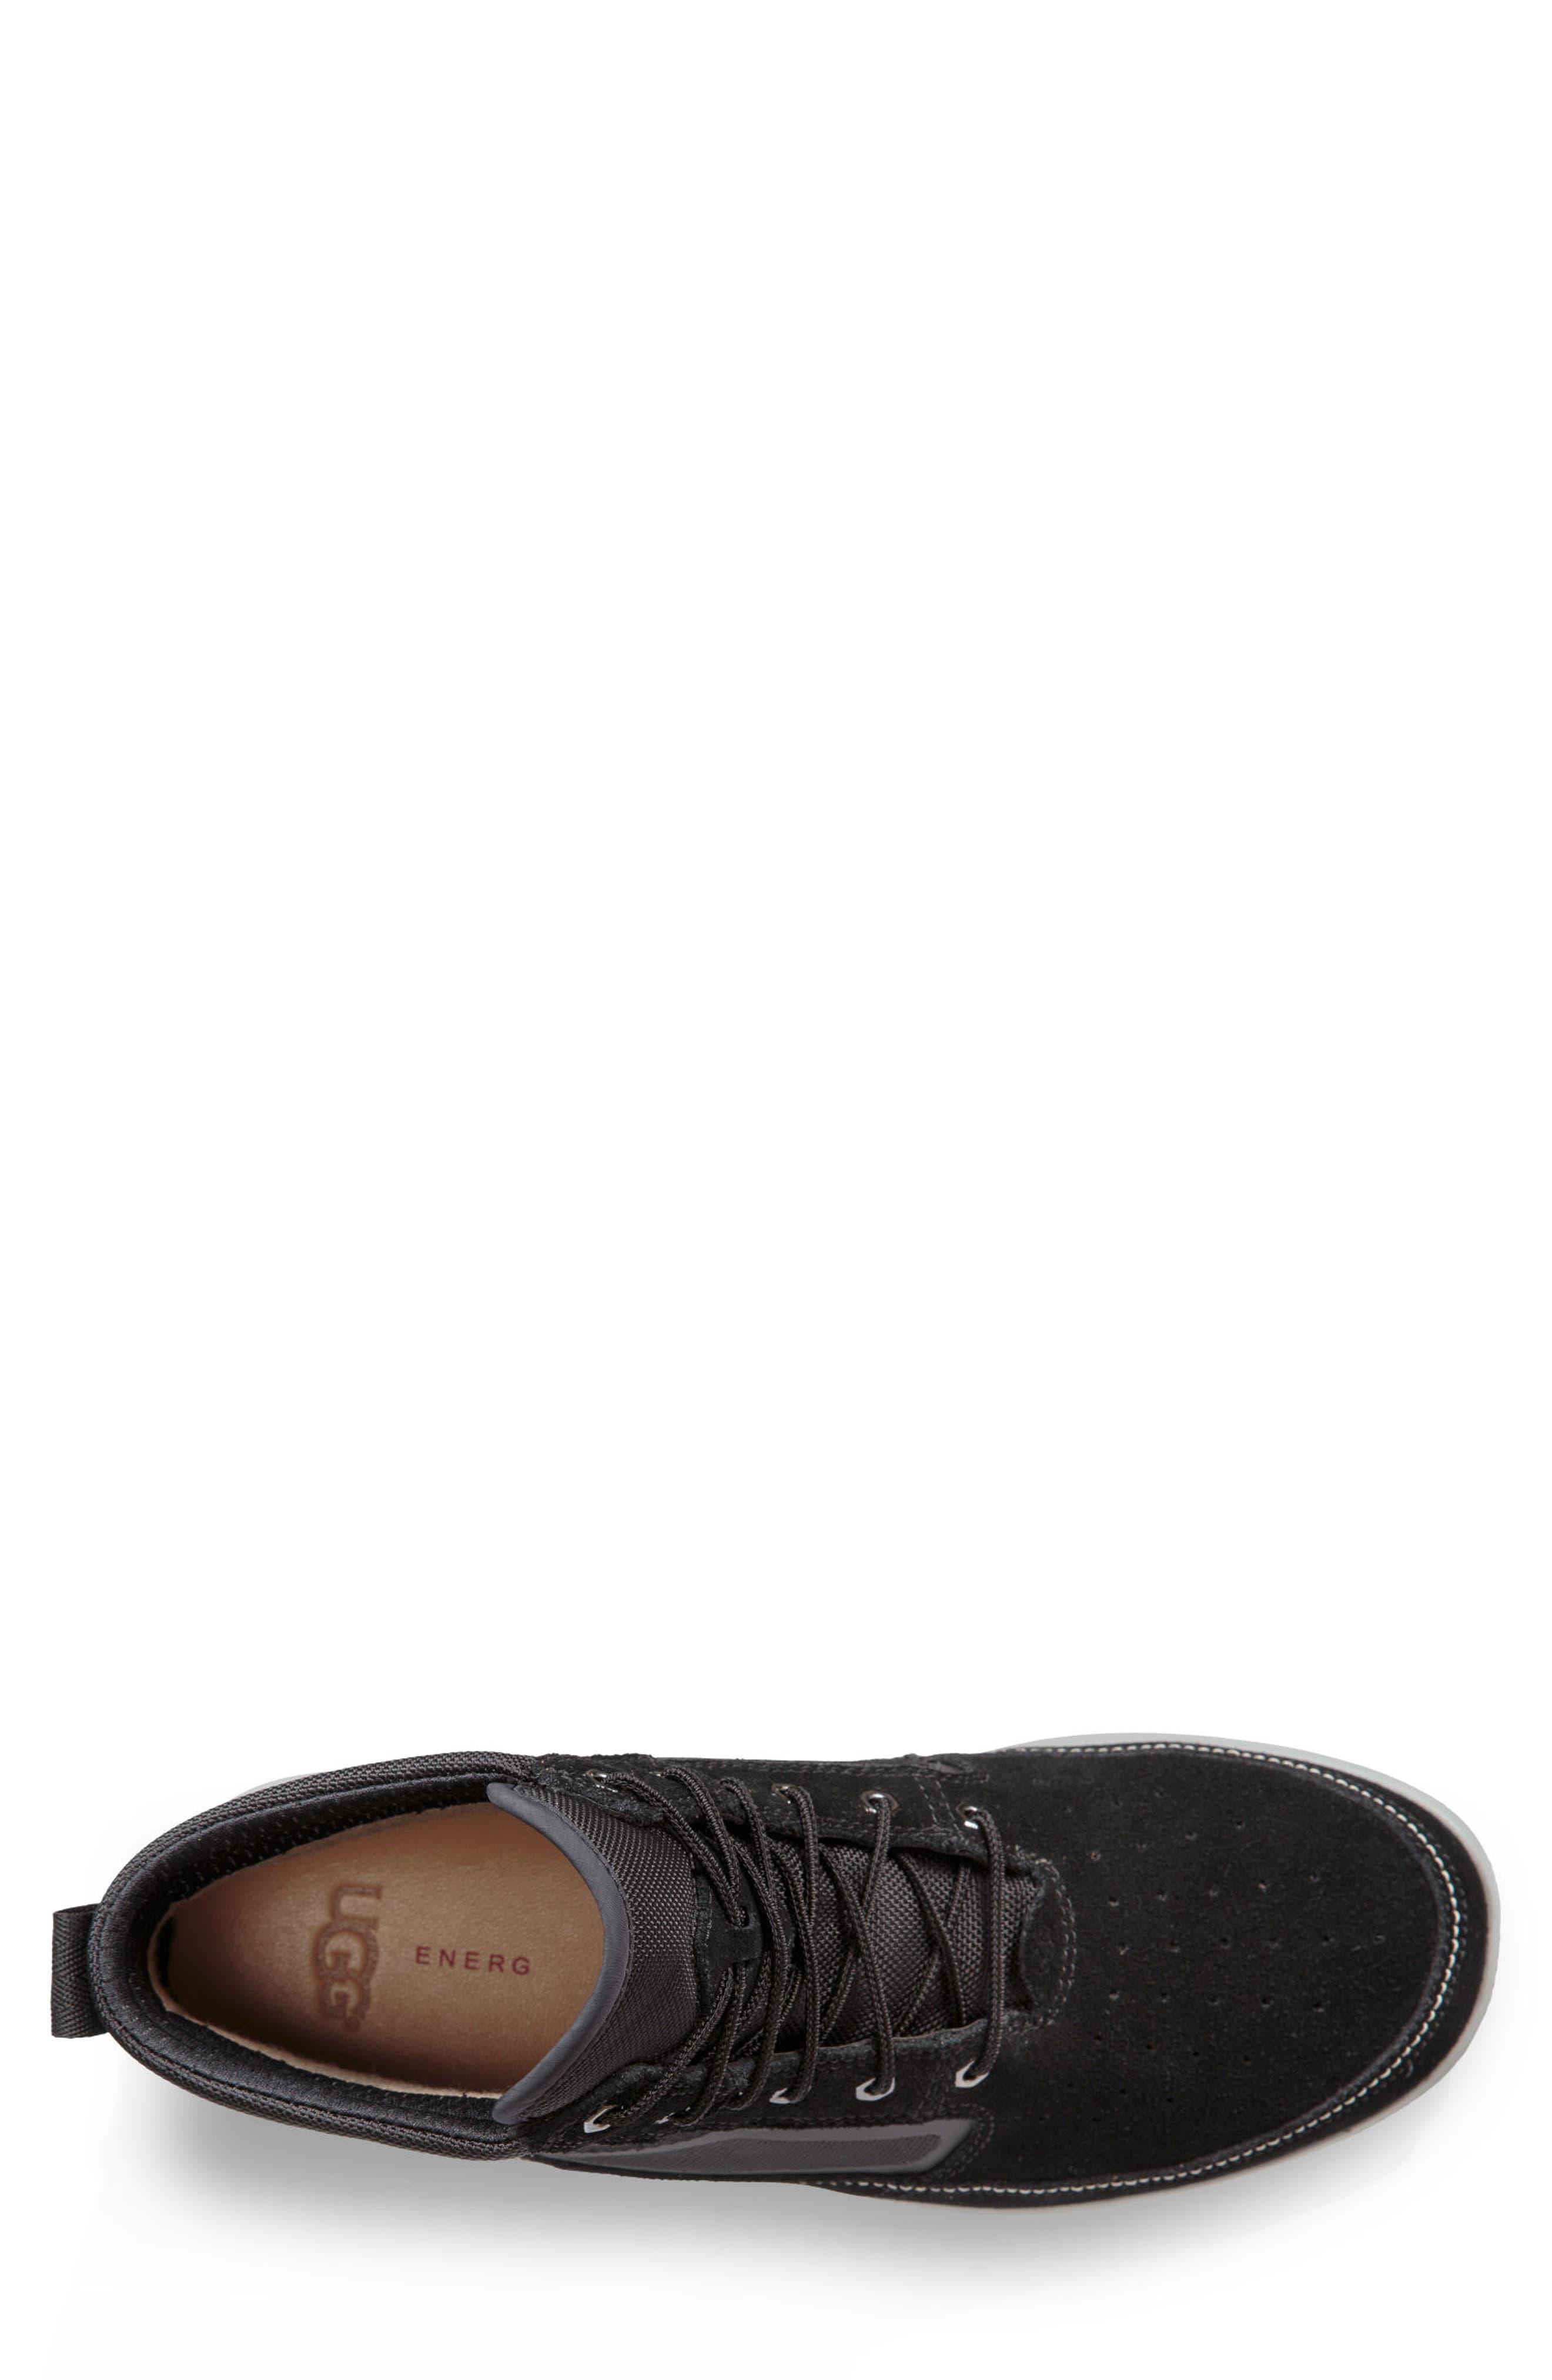 Hepner Moc Toe Boot,                             Alternate thumbnail 4, color,                             001